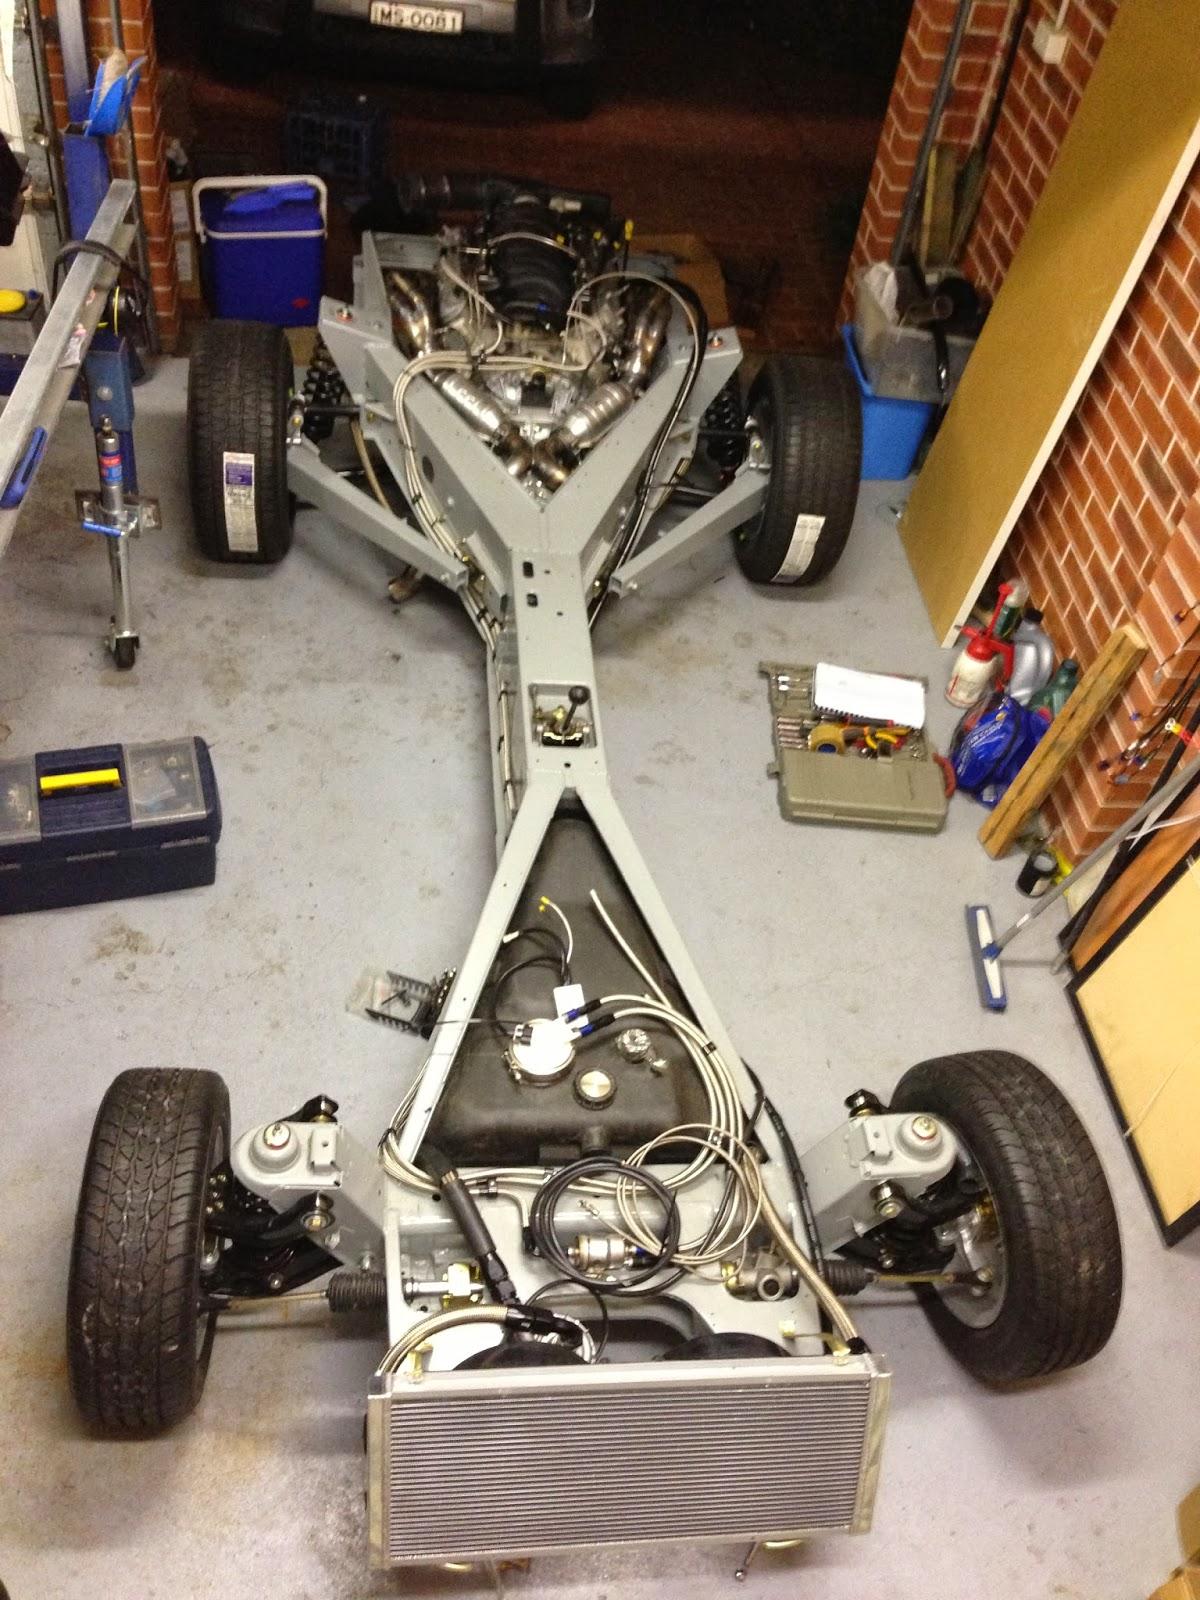 The V8 | V8 Time Machine Project